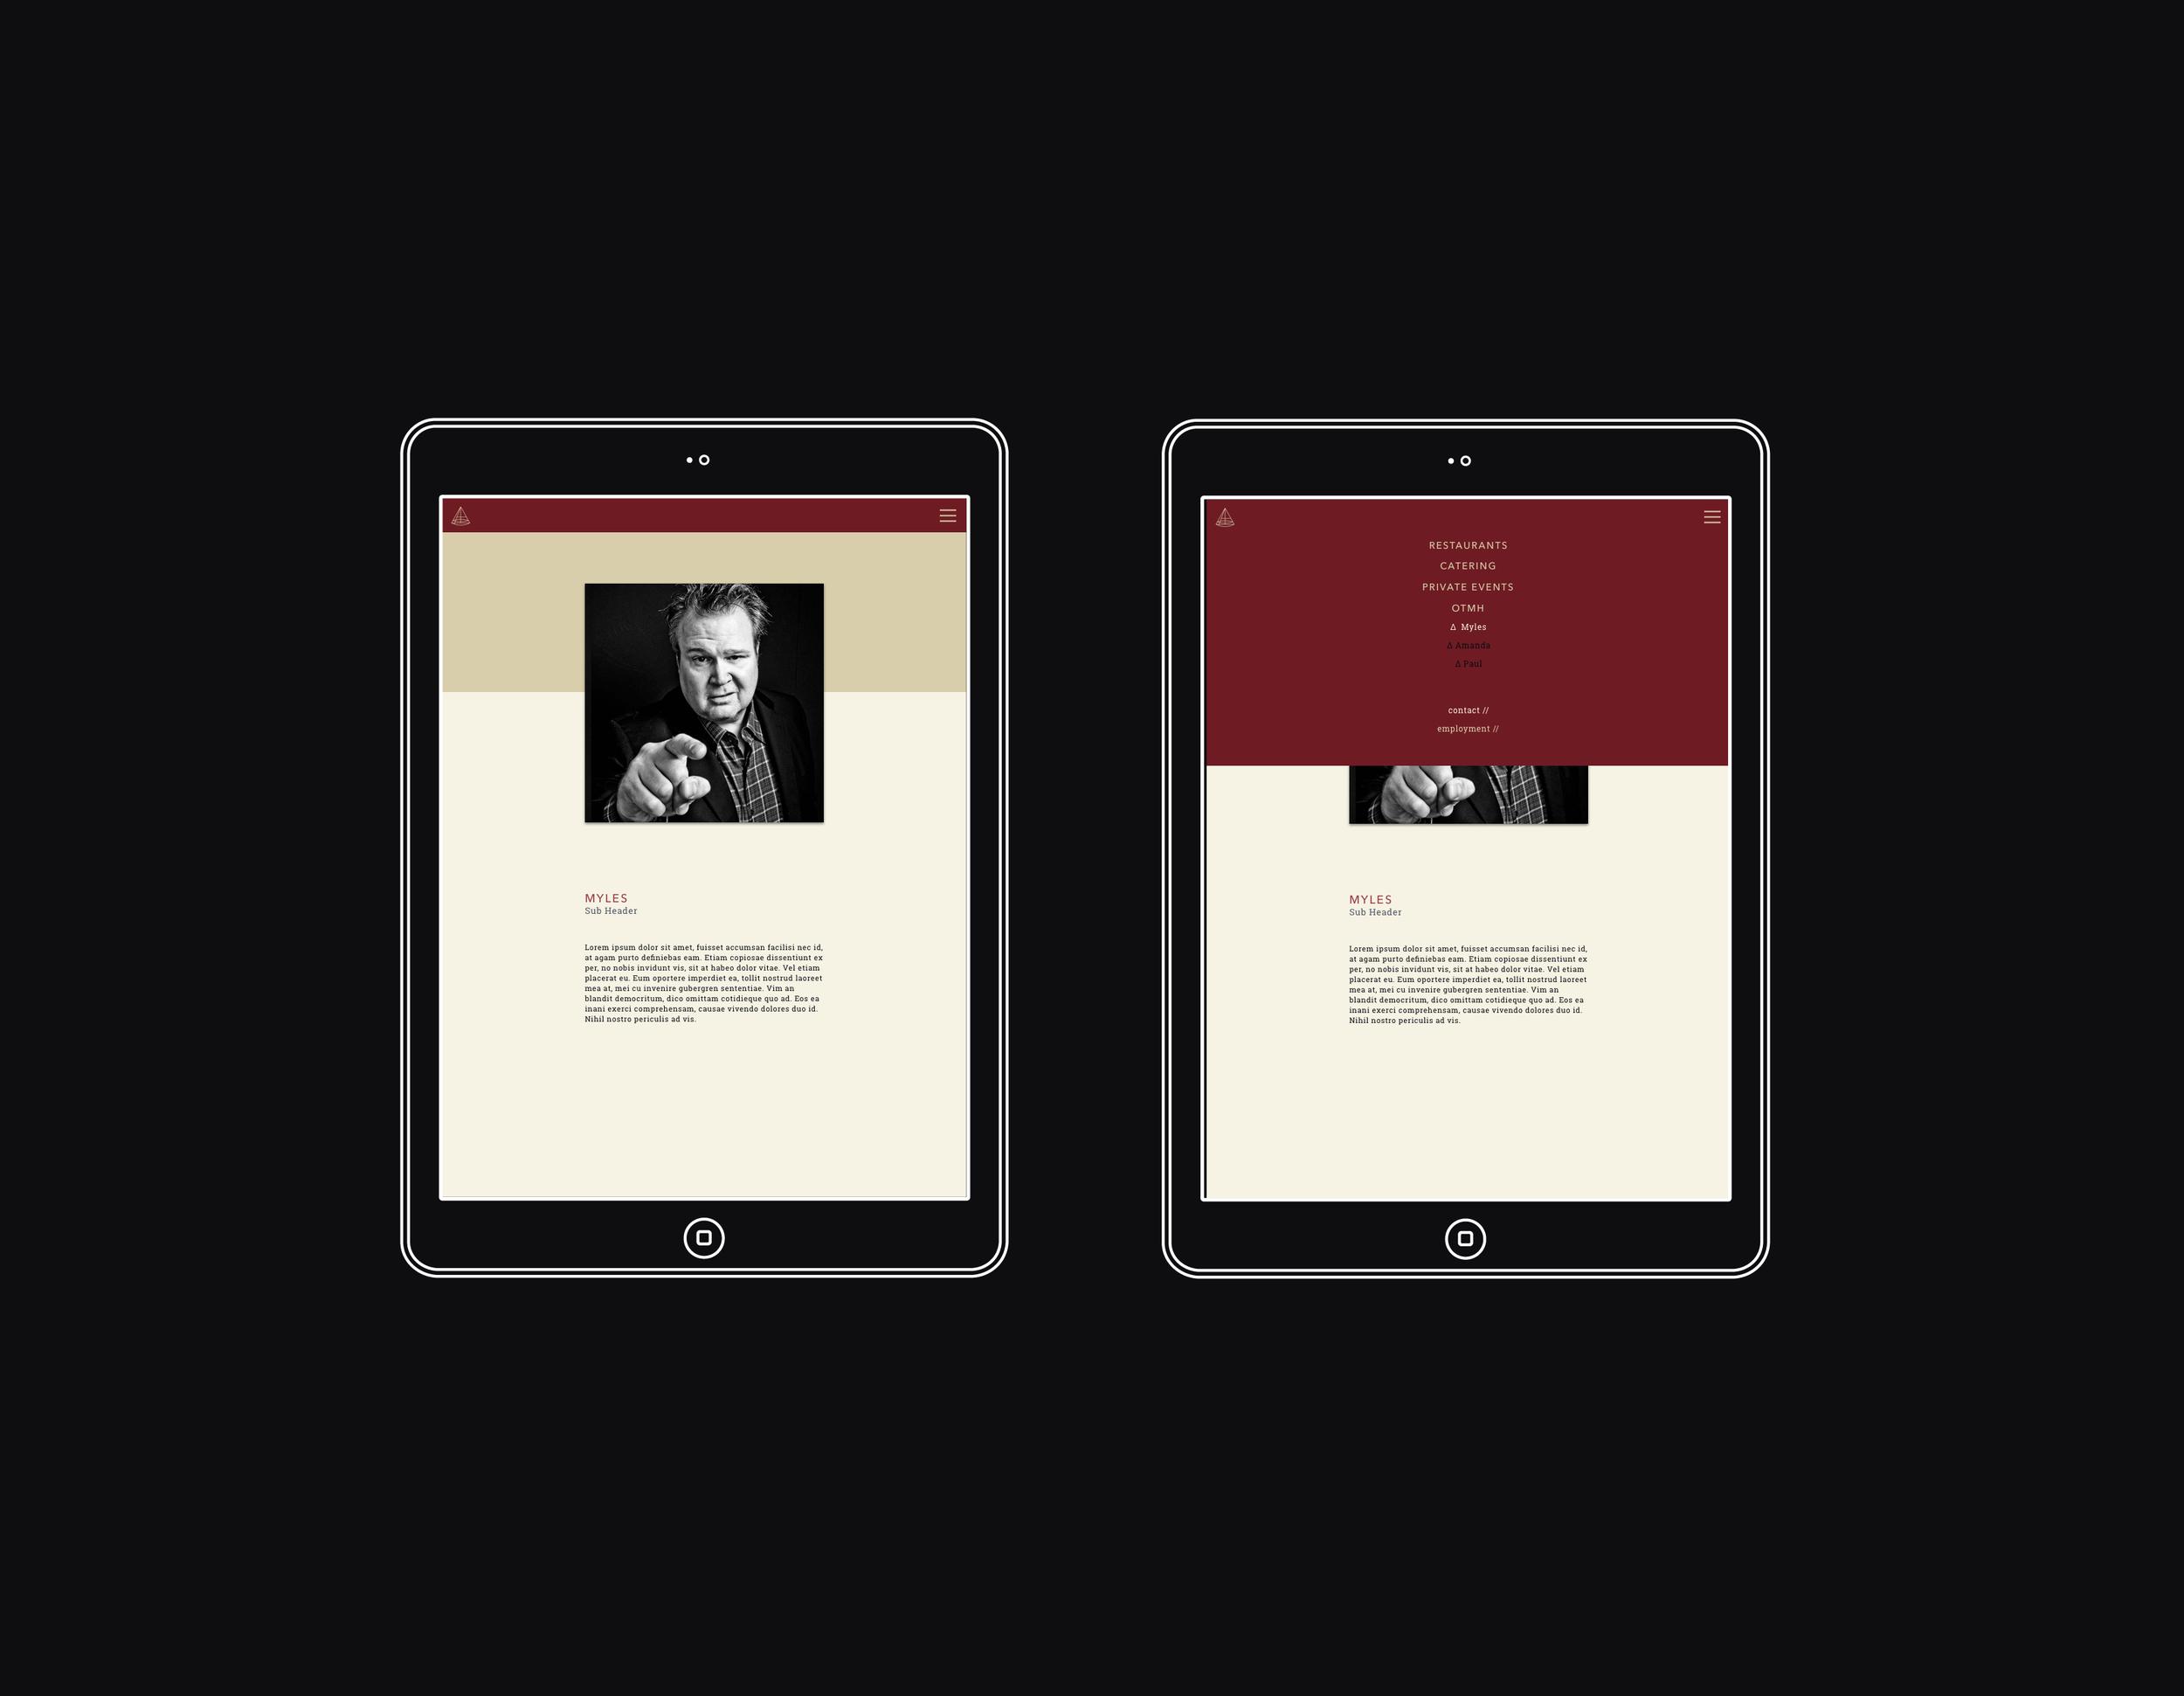 OTMH_WebMock_Artboard 2 copy 3.png